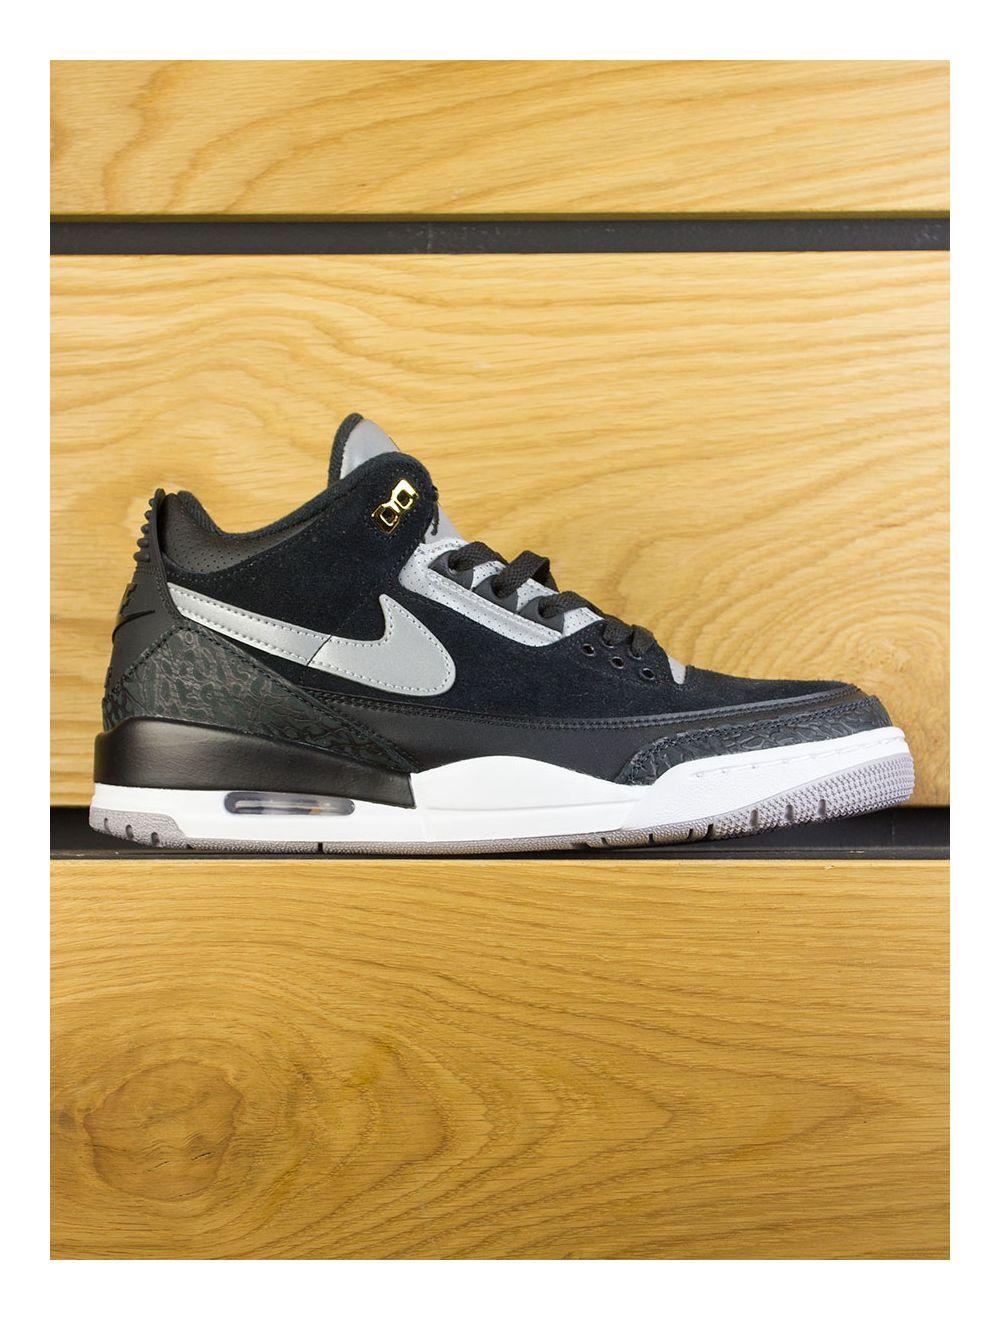 new style 4ab53 67c12 Nike Air Jordan Retro 3 Tinker Hatfield - Black Cement Grey